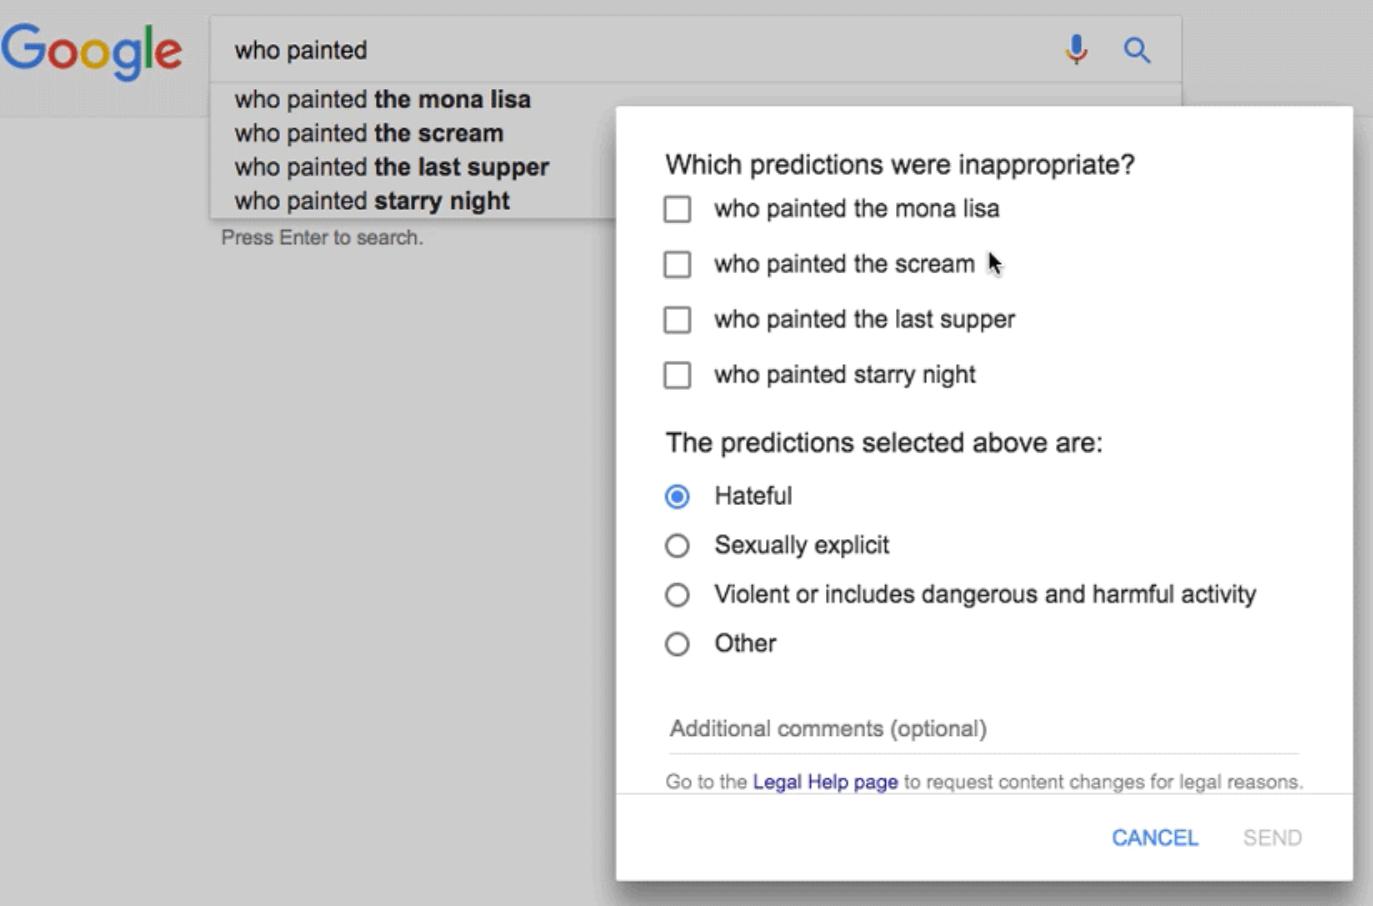 google feedback form - Carnaval.jmsmusic.co